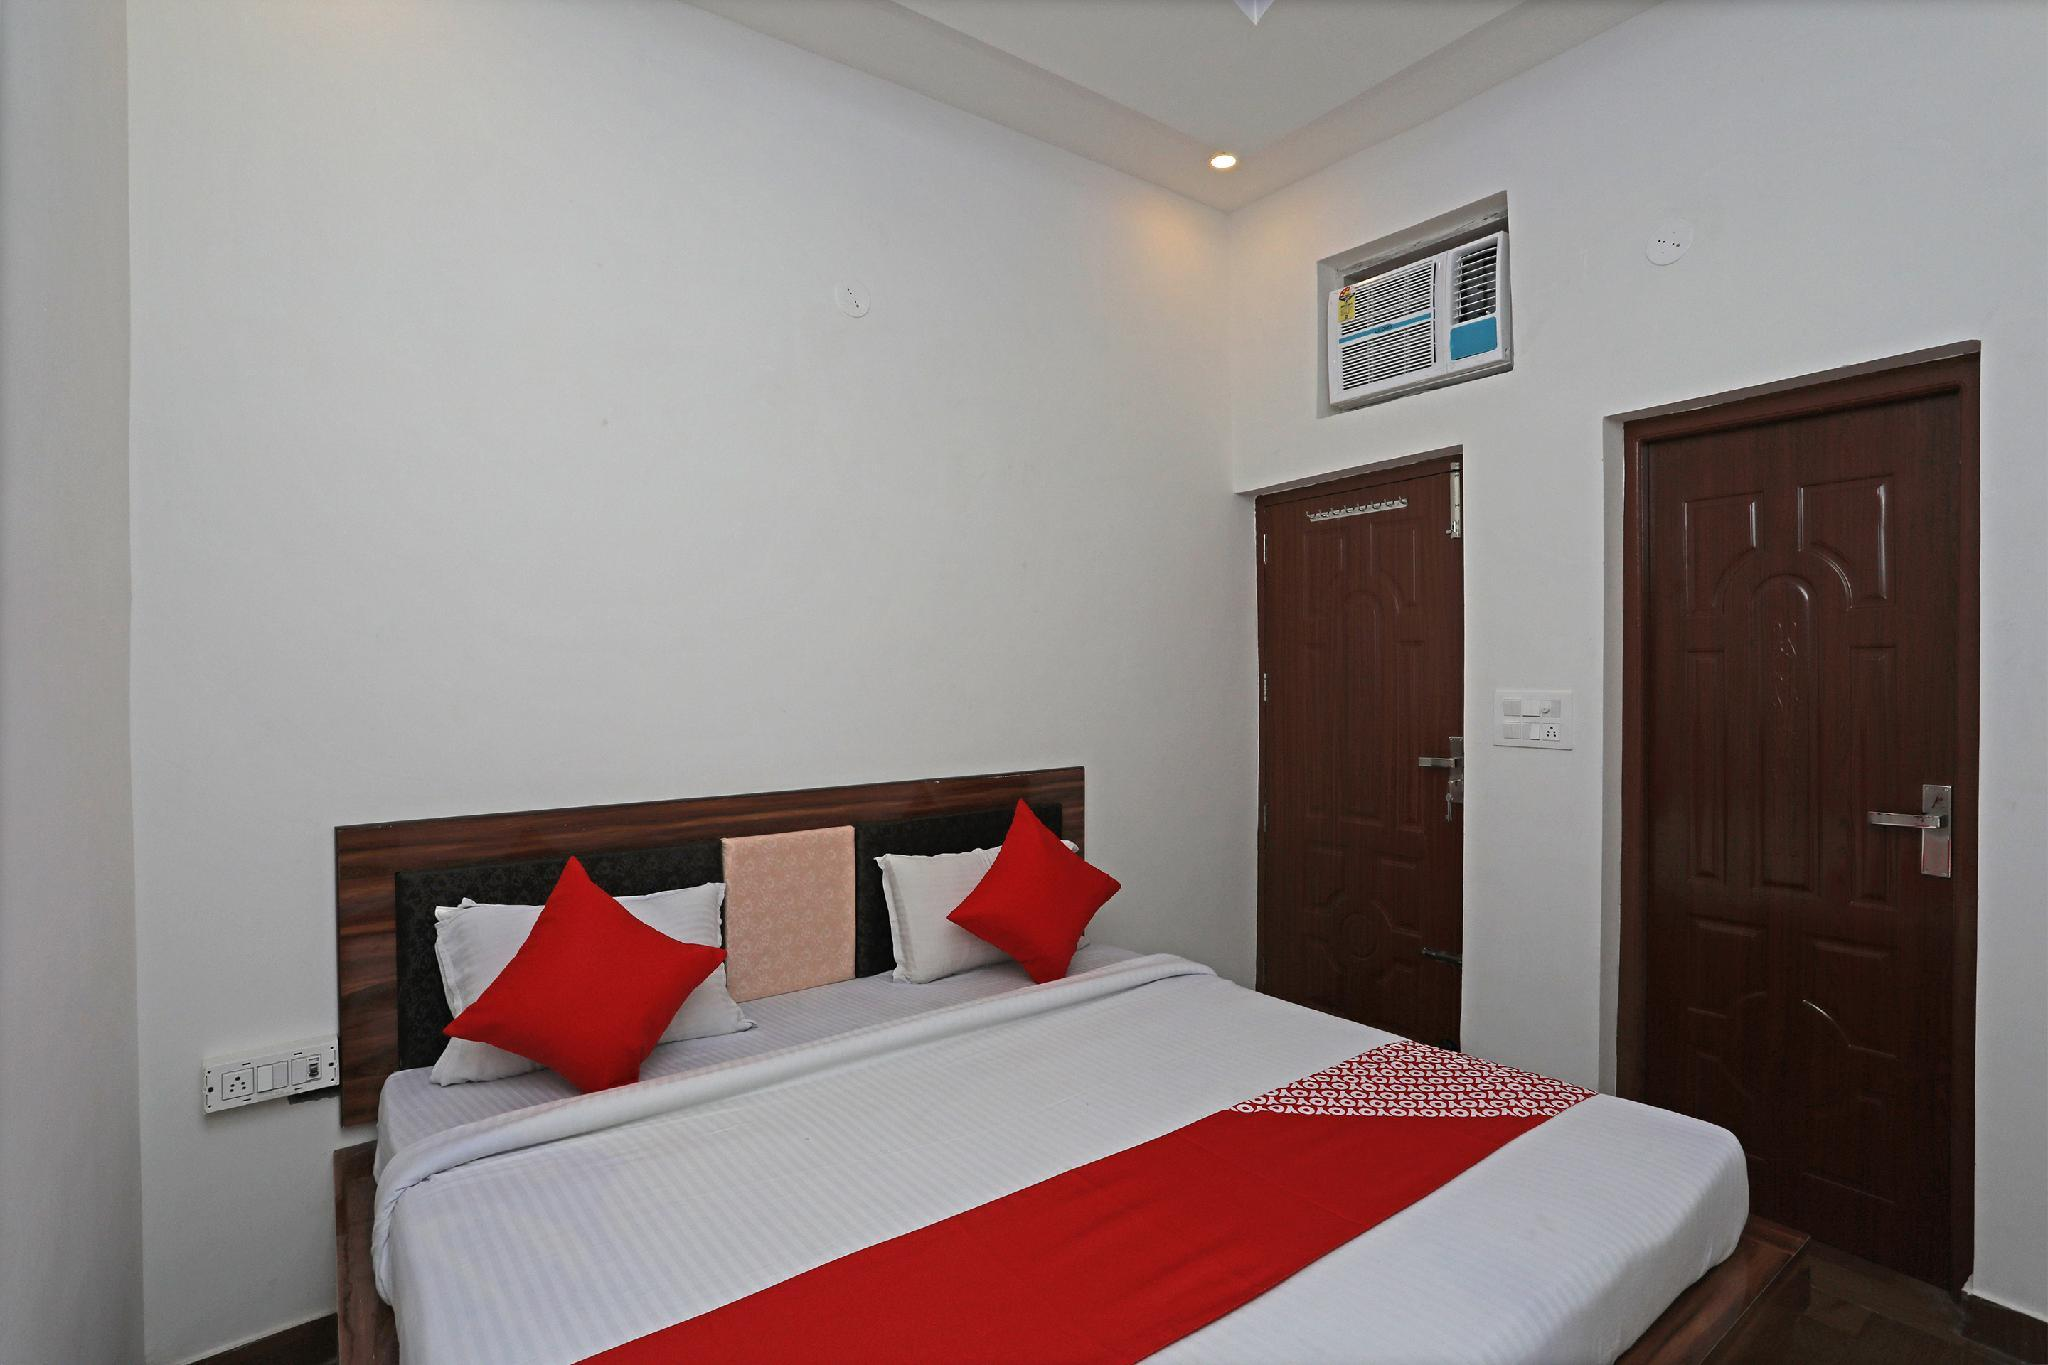 OYO 33001 Hotel Ab Residency